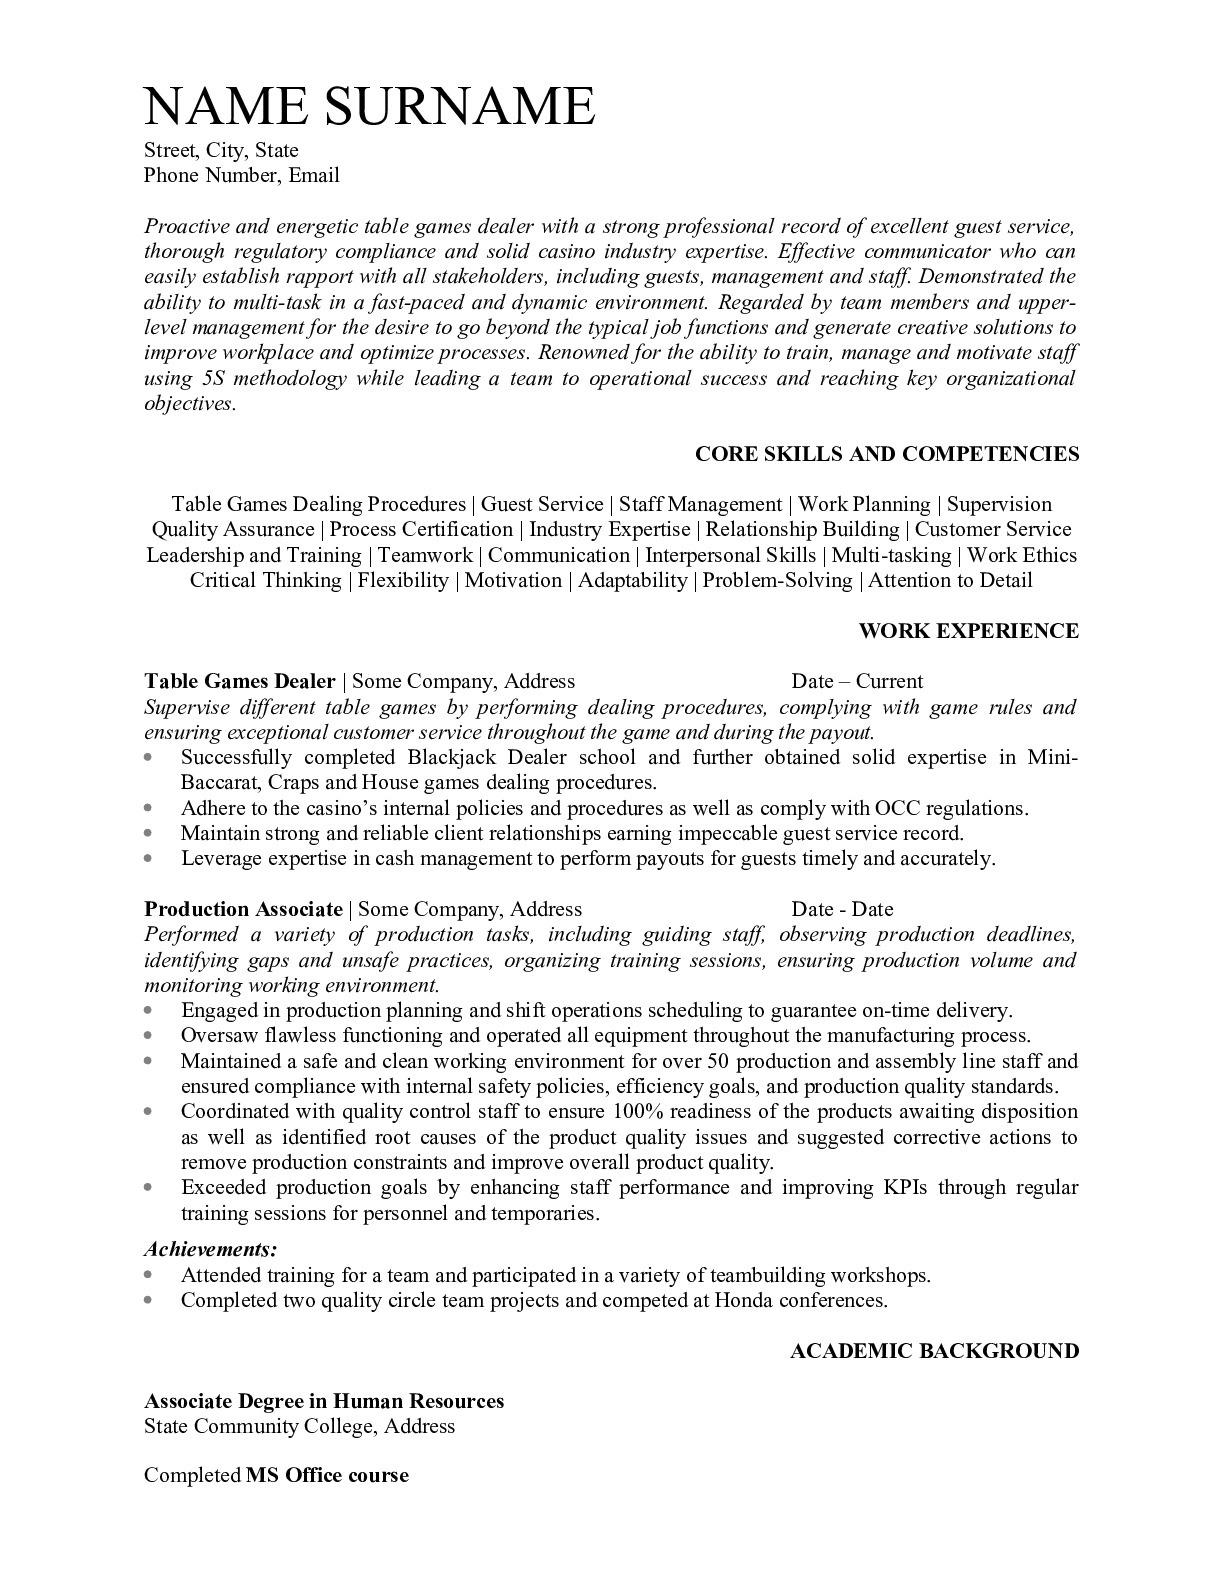 Resume for Table Game Dealer